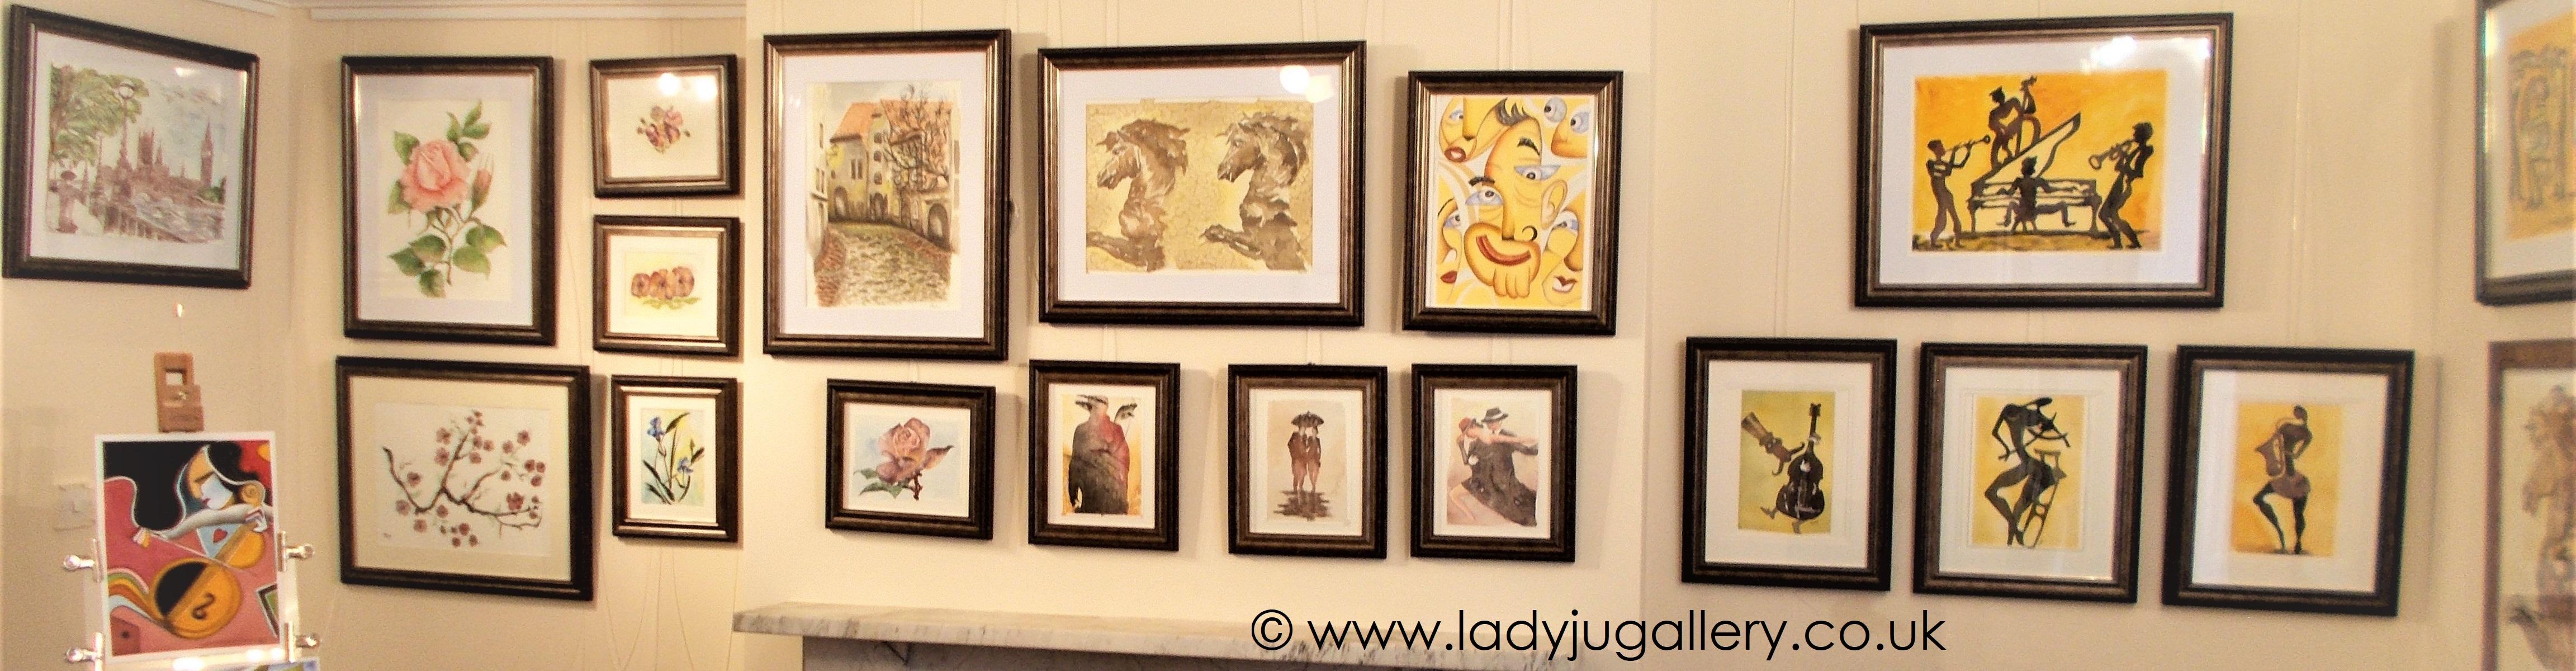 Lady_ju_gallery_new_exhibition_preparation (1)